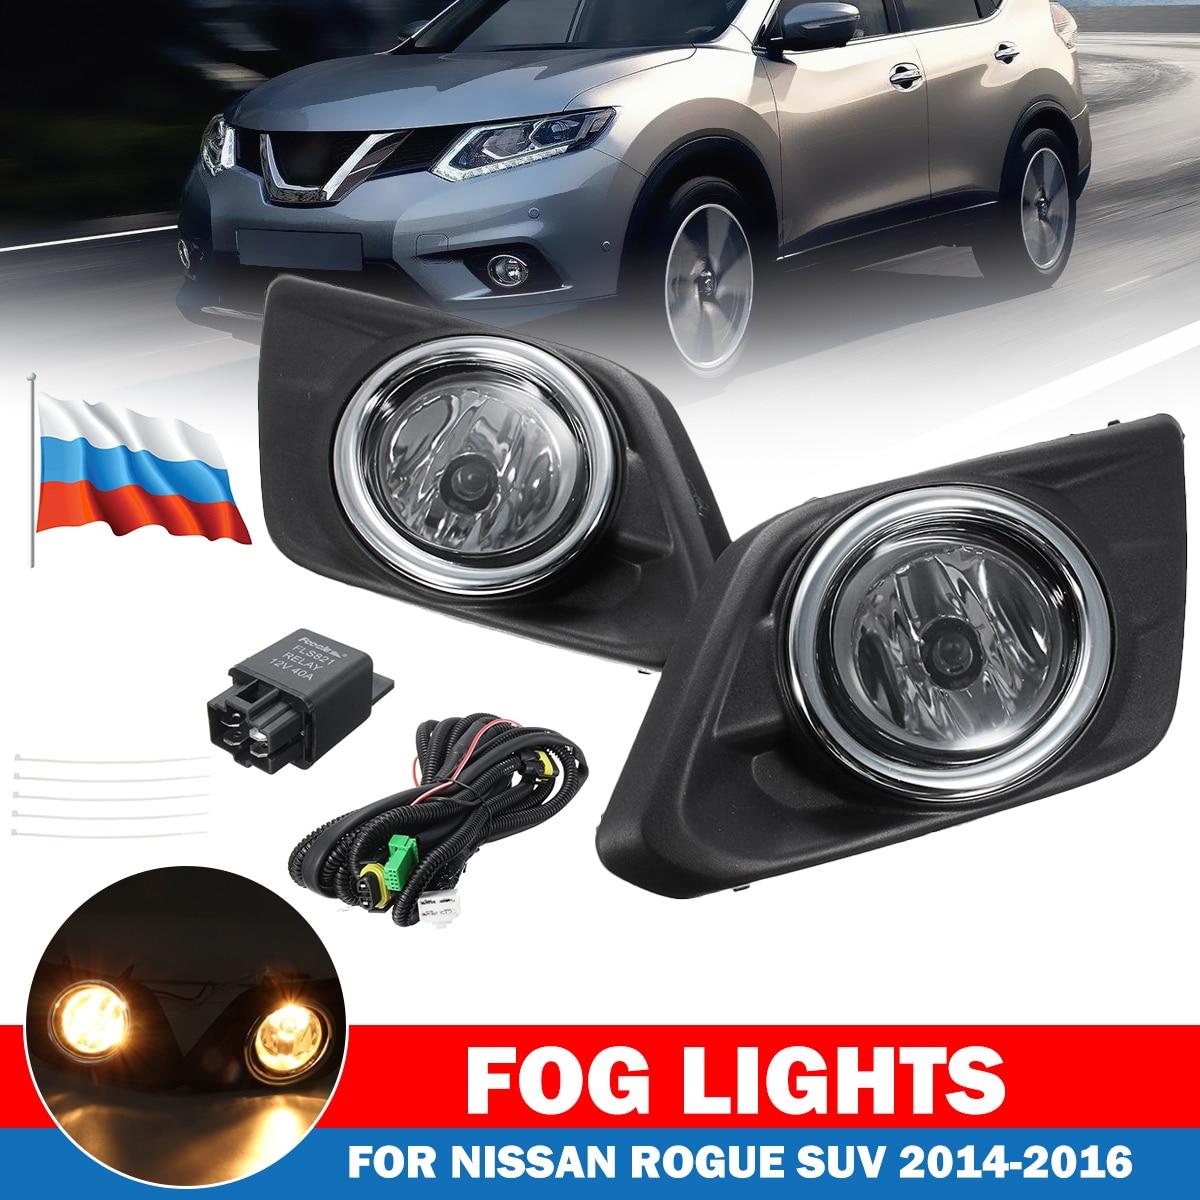 NI1039132 Front Passenger Side Fog Light Bezel Fits 2014-2016 Nissan Rogue